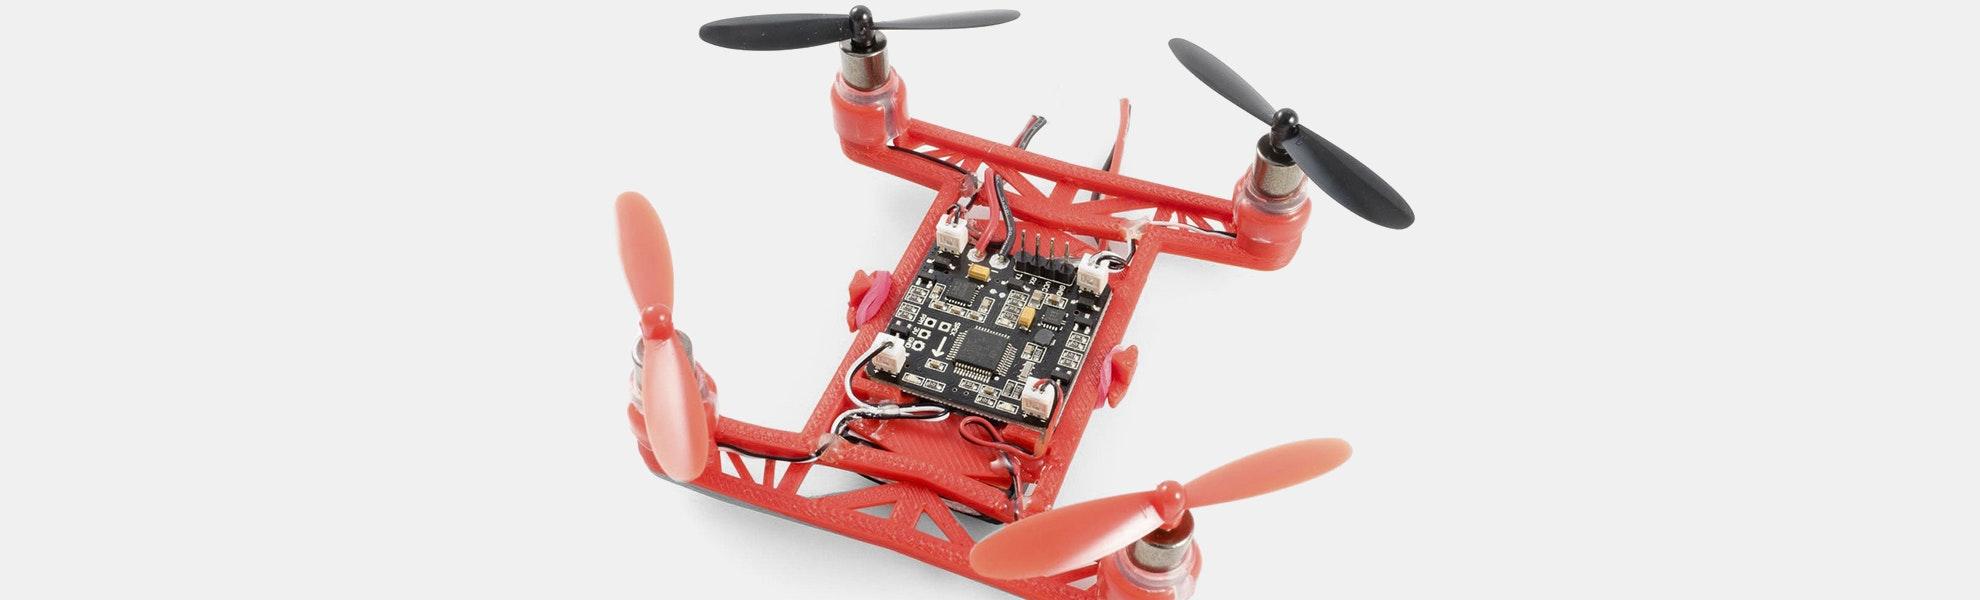 Hovership DIY 3DFly Micro-Quad Kit